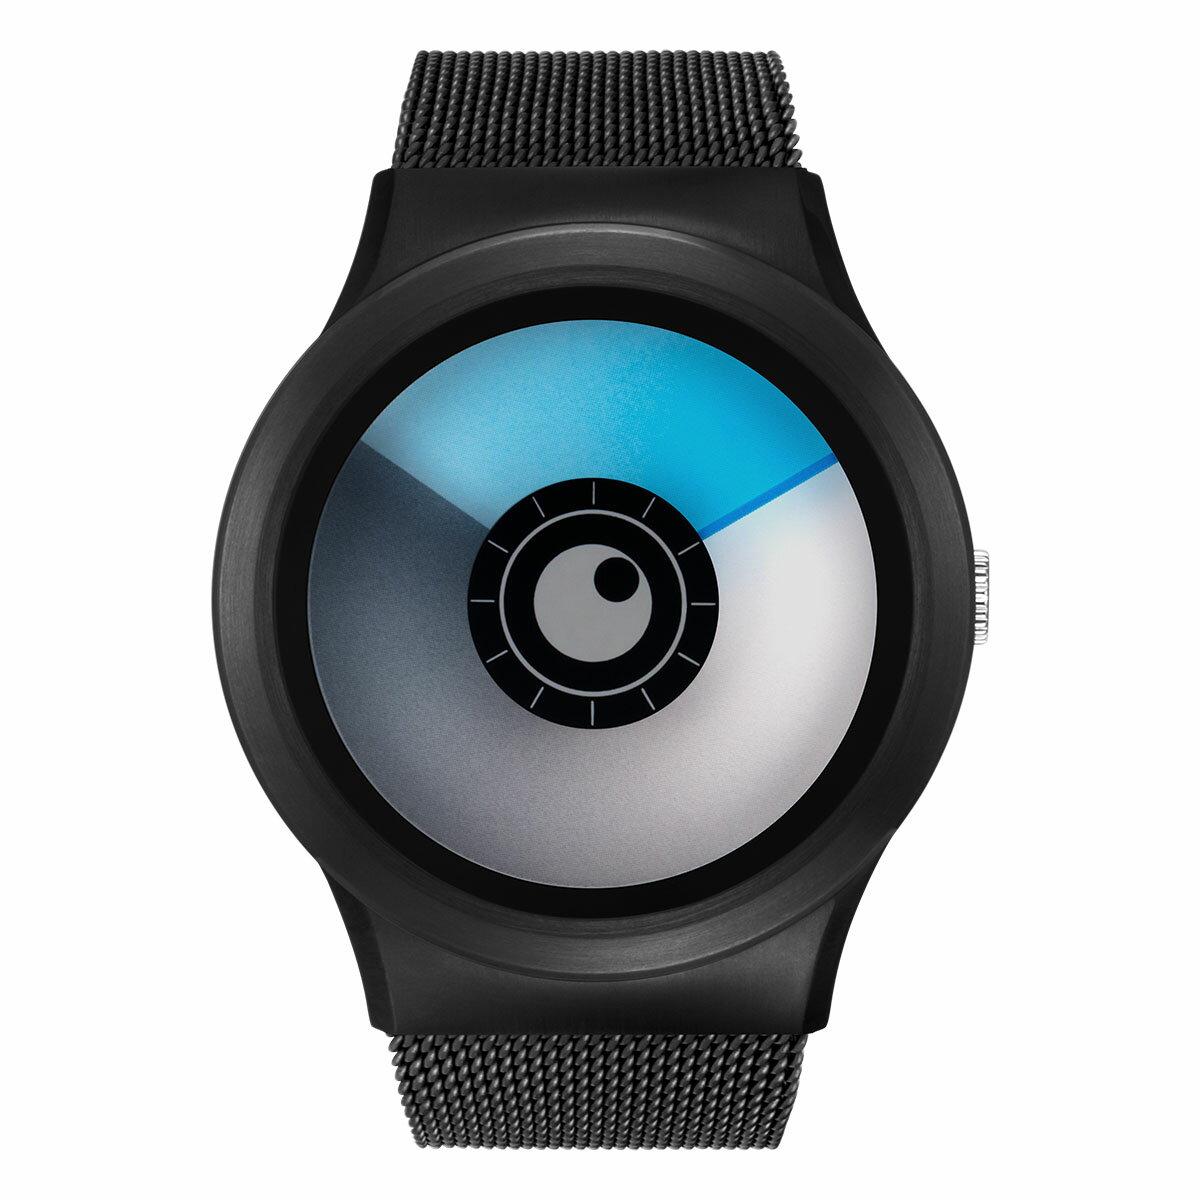 ZEROO AURORA BOREALIS ゼロ 電池式クォーツ 腕時計 [W12024B03SM03] ブルー デザインウォッチ ペア用 メンズ レディース ユニセックス おしゃれ時計 デザイナーズ